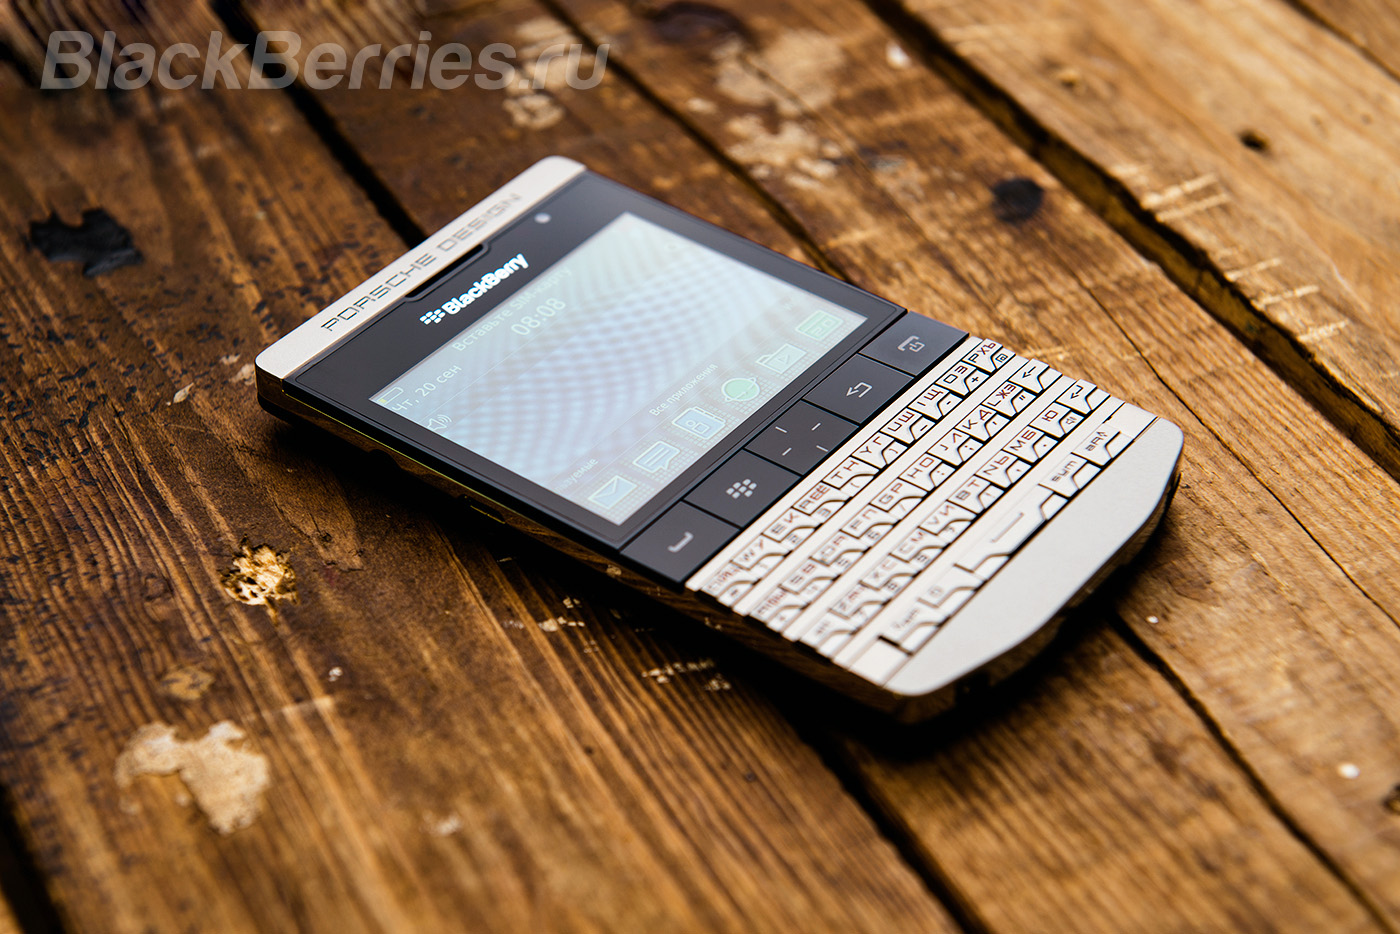 blackberry-porsche-design-rostest-4 copy